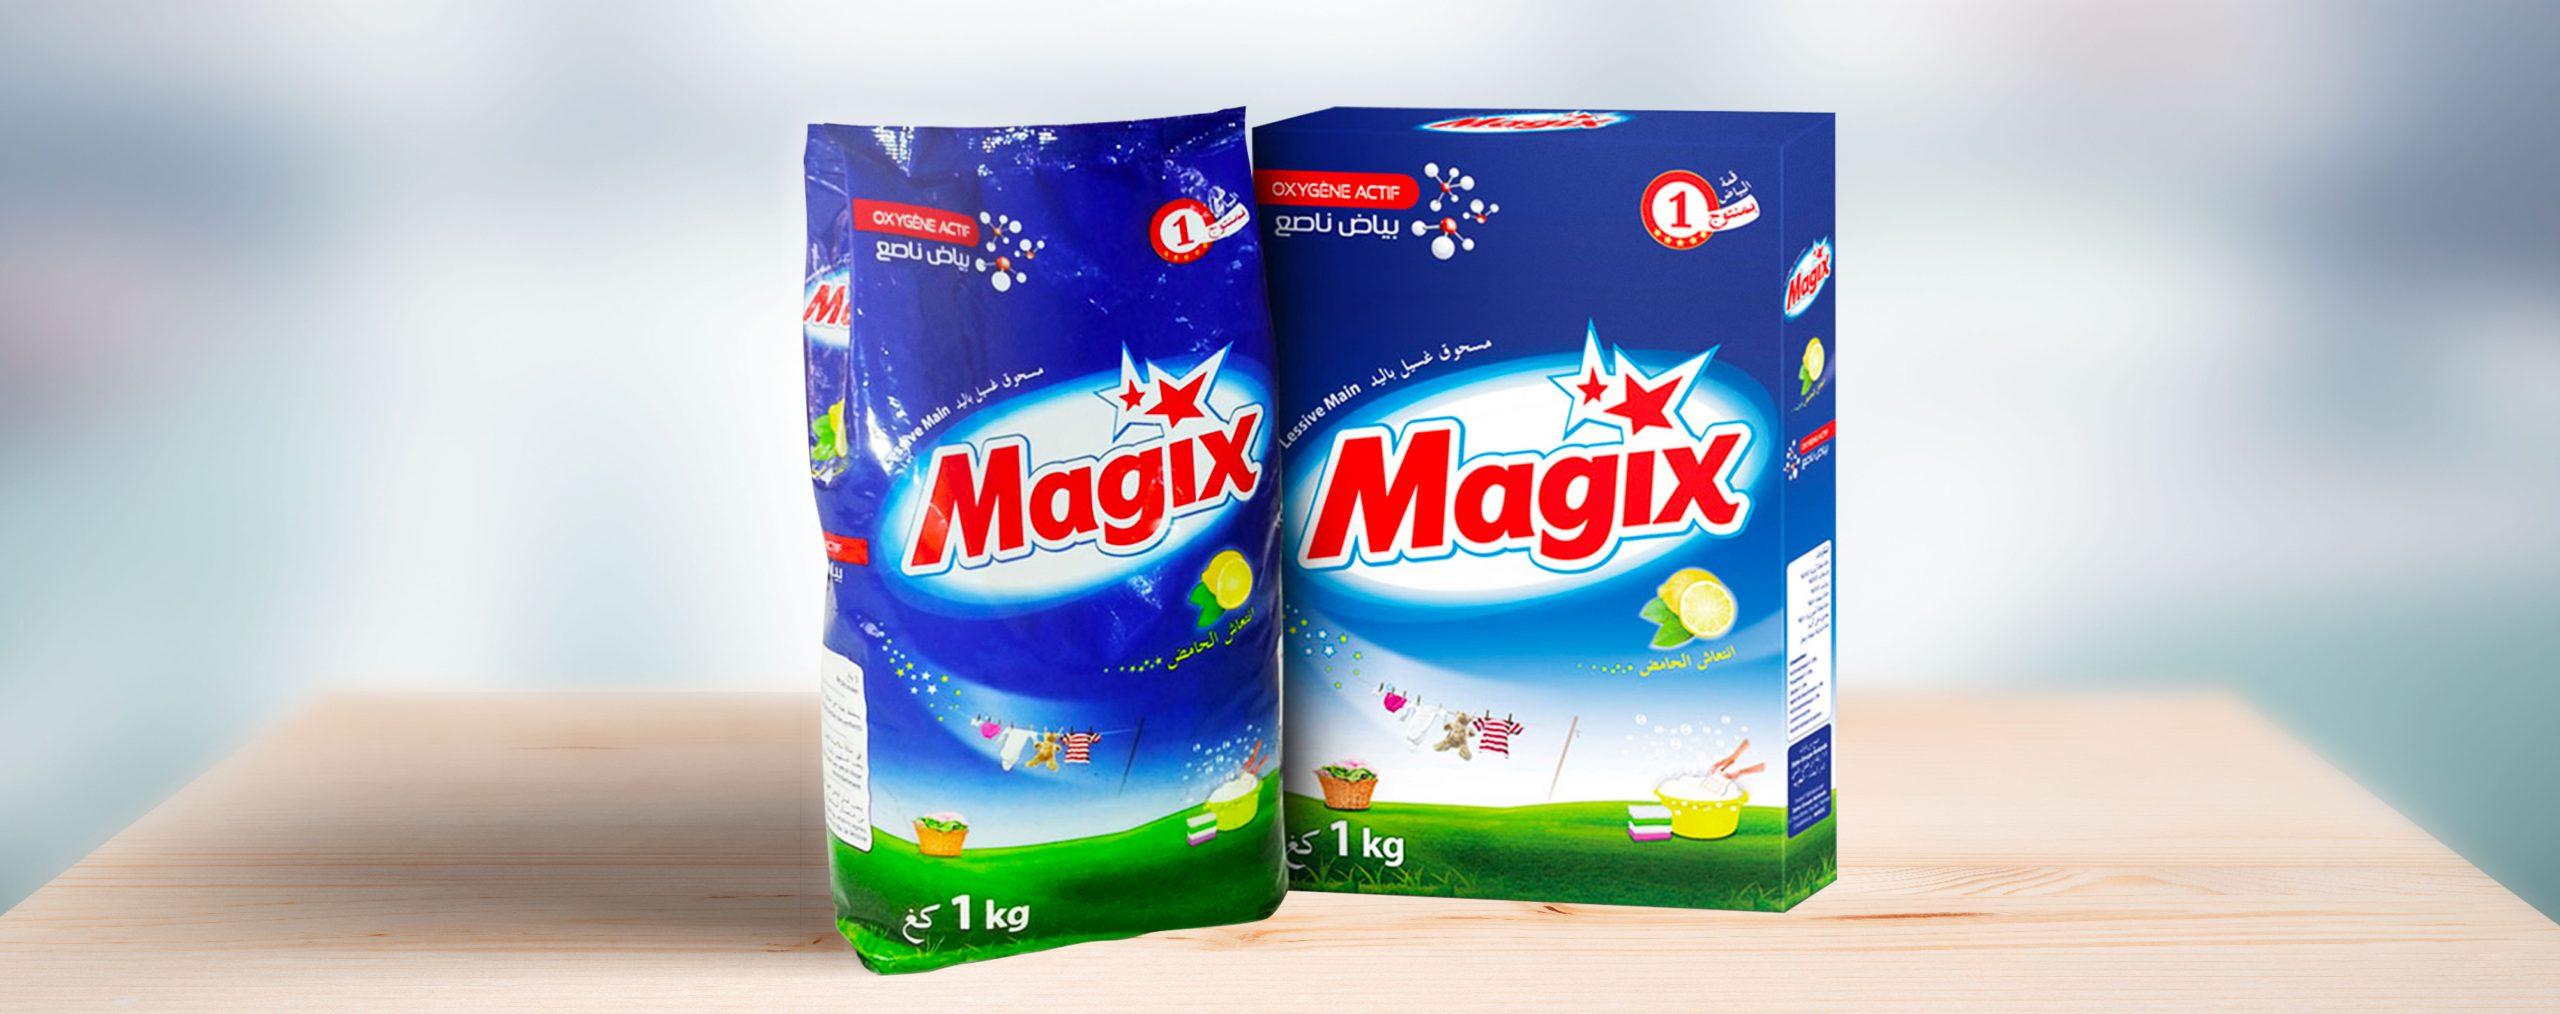 magix packaging